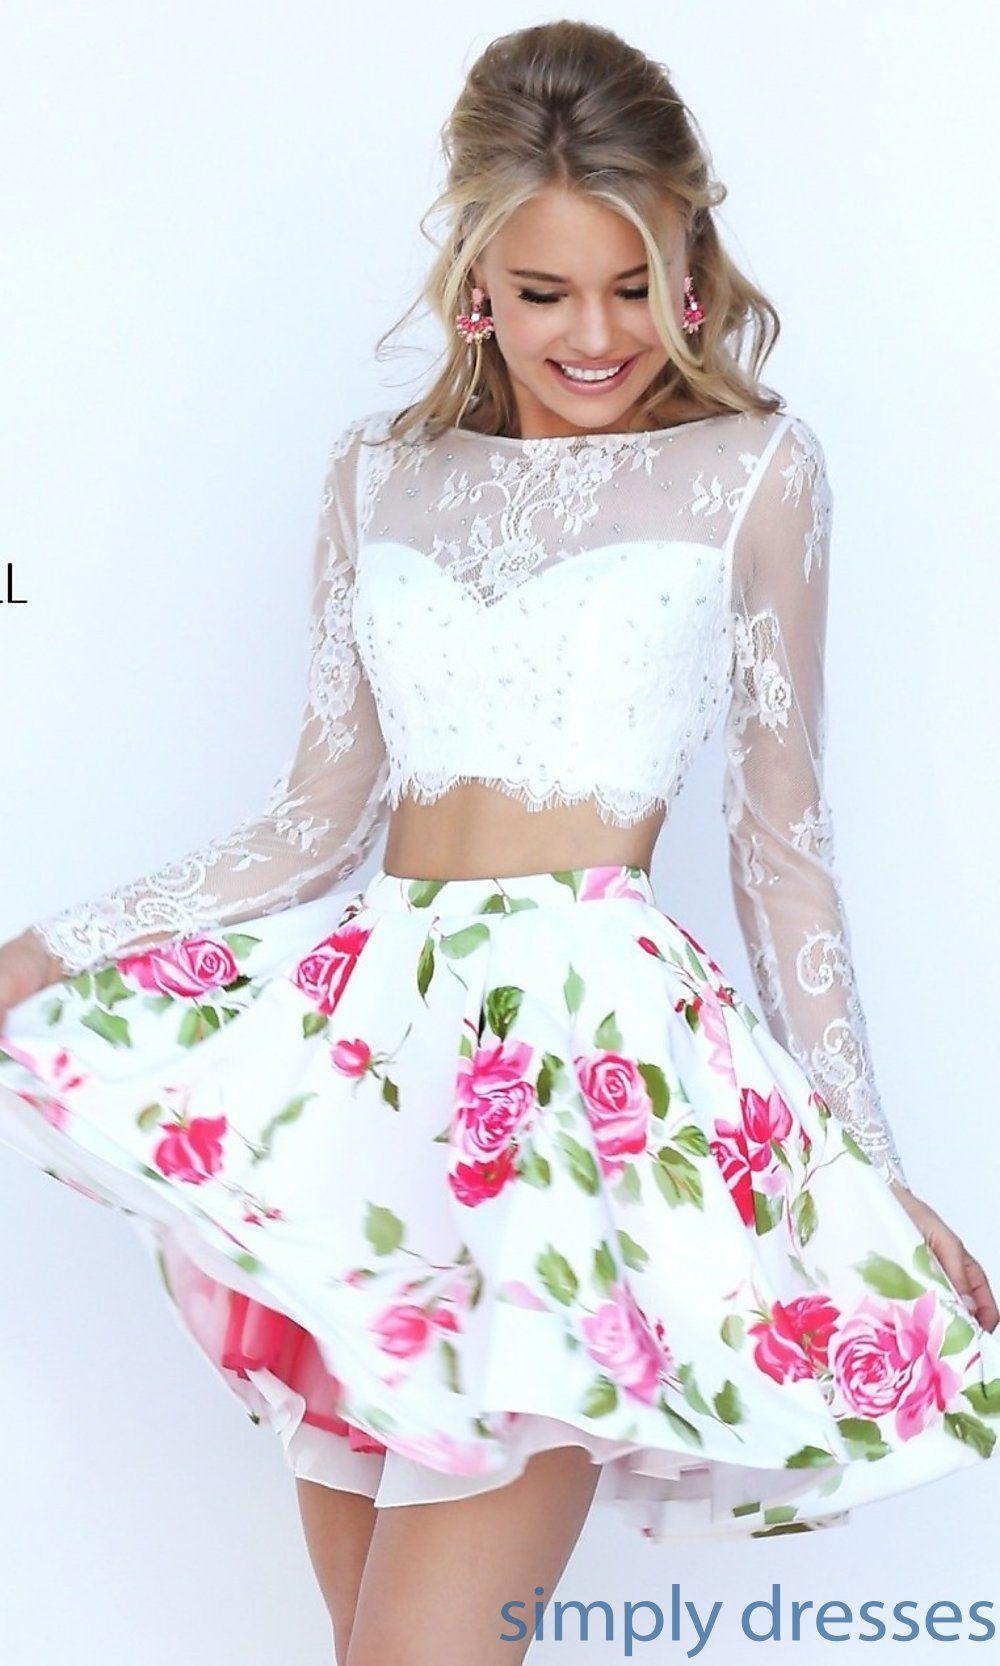 Homecoming Dresses Formal Prom Dresses Evening Wear SH